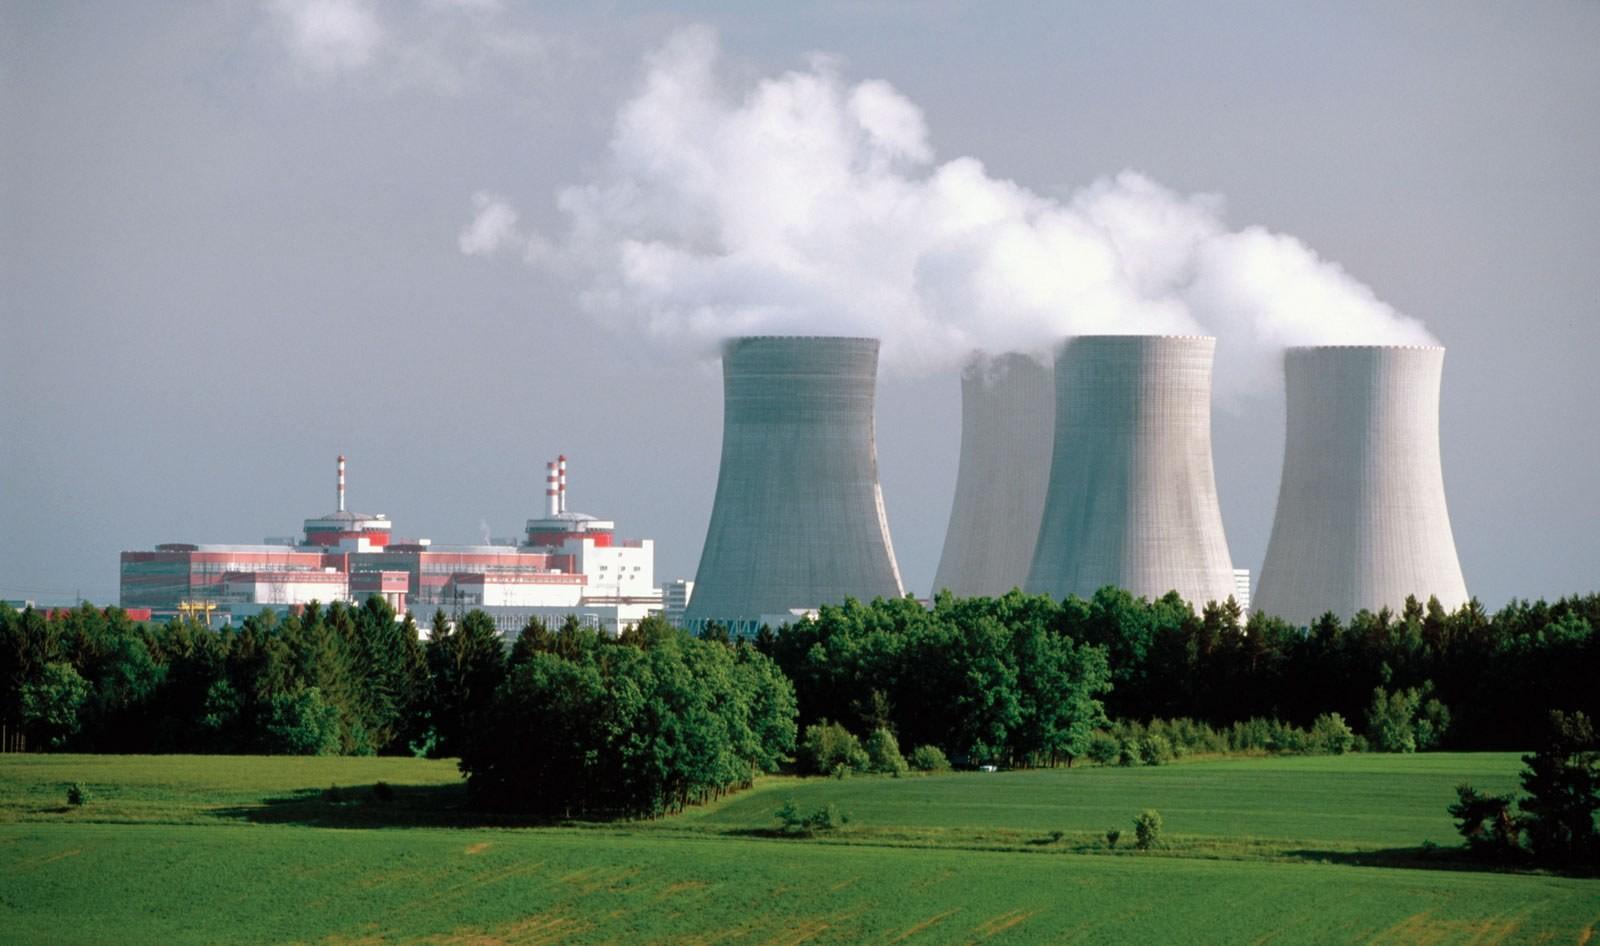 Ўзбекистонда атом электр станцияси қуриладими?